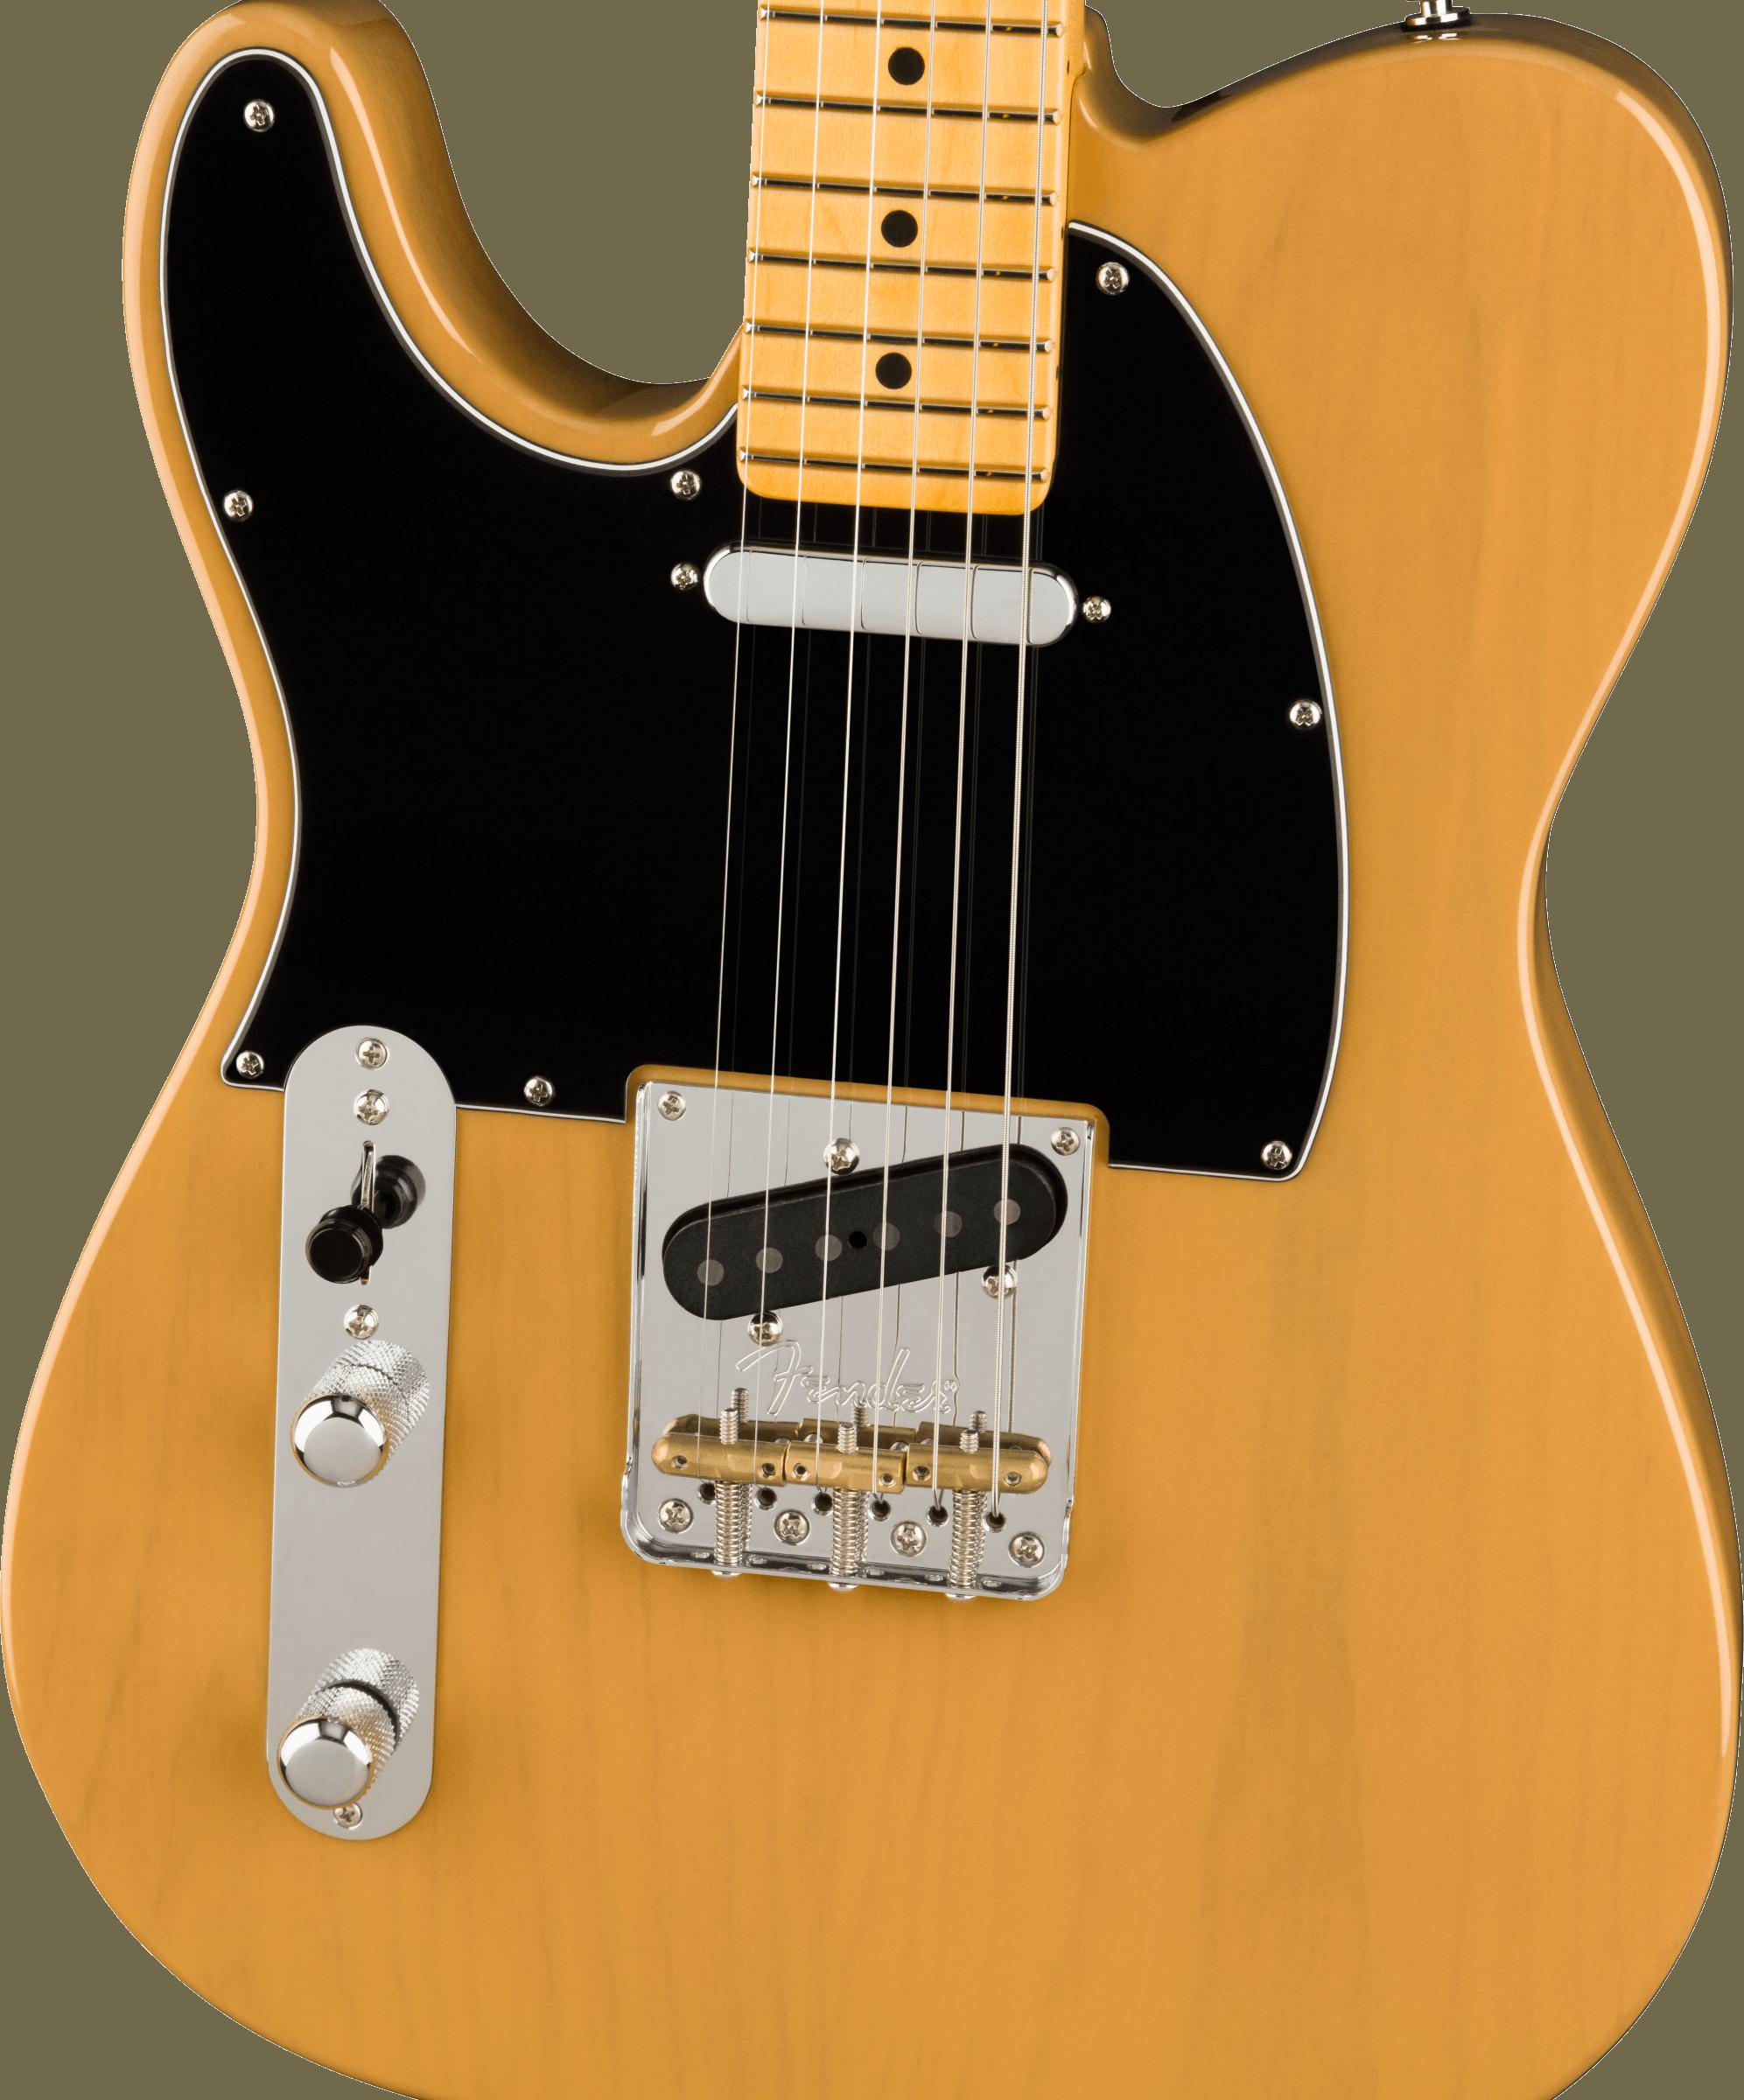 Fender American Professional II Telecaster® Left-Hand, Maple Fingerboard, Butterscotch Blonde